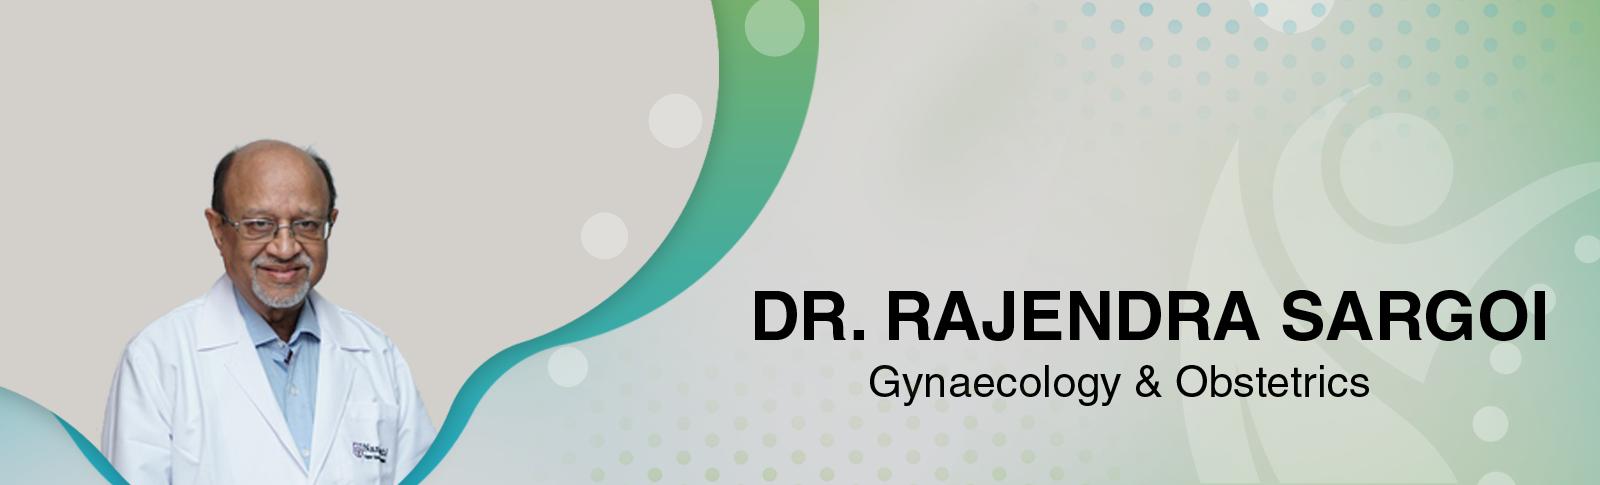 Dr. Rajendra Saraogi